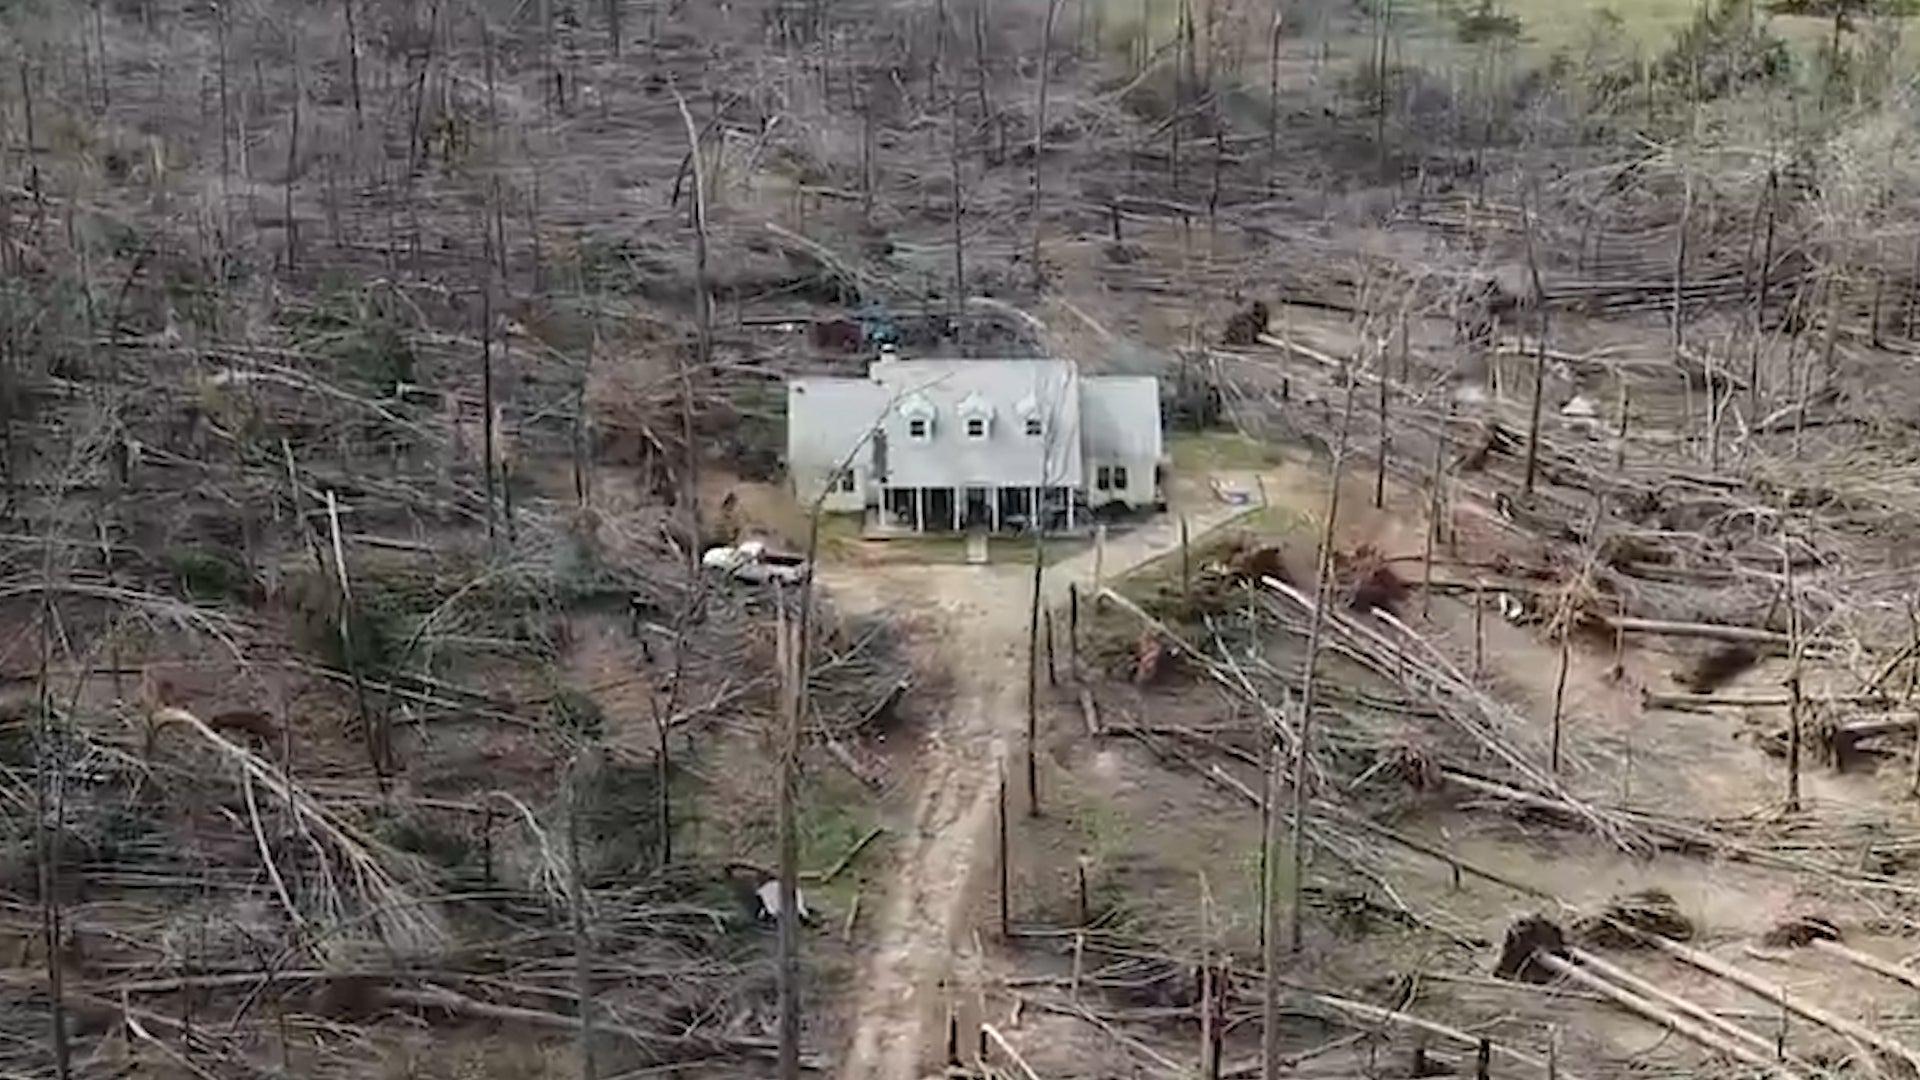 House Somehow Survives Destructive Tornado in Georgia